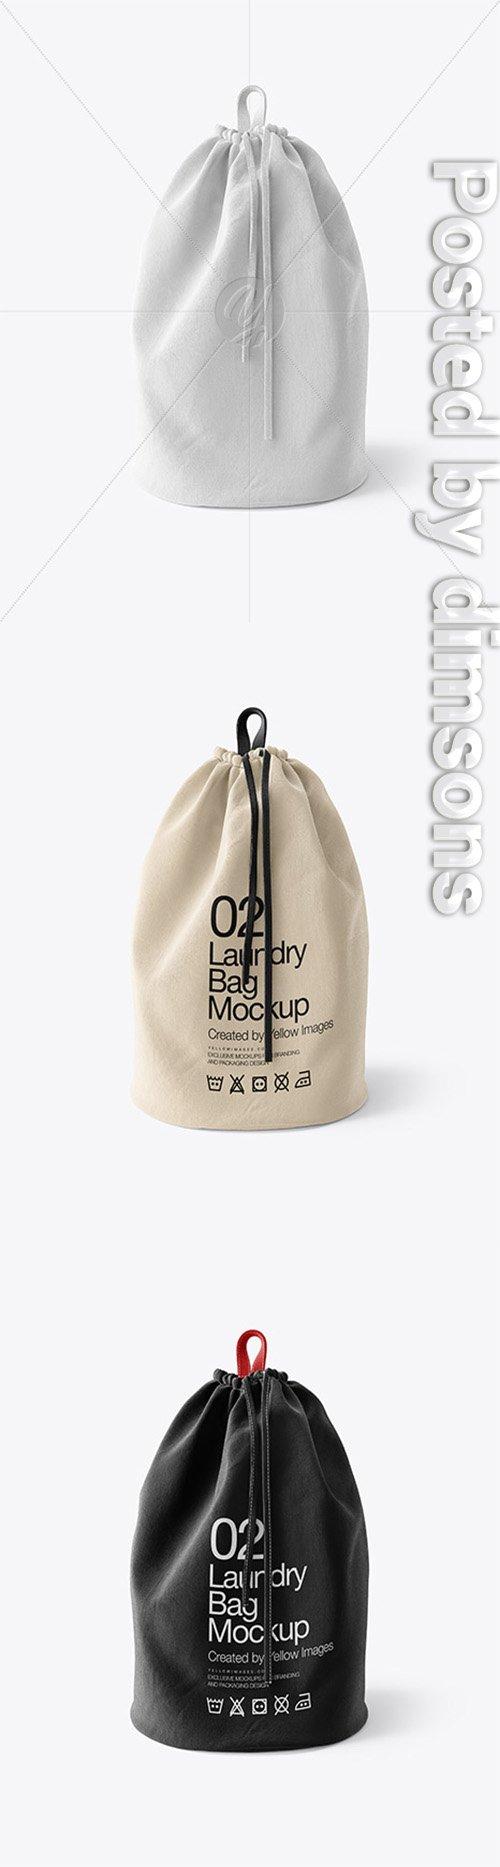 Laundry Bag Mockup 35595 TIF